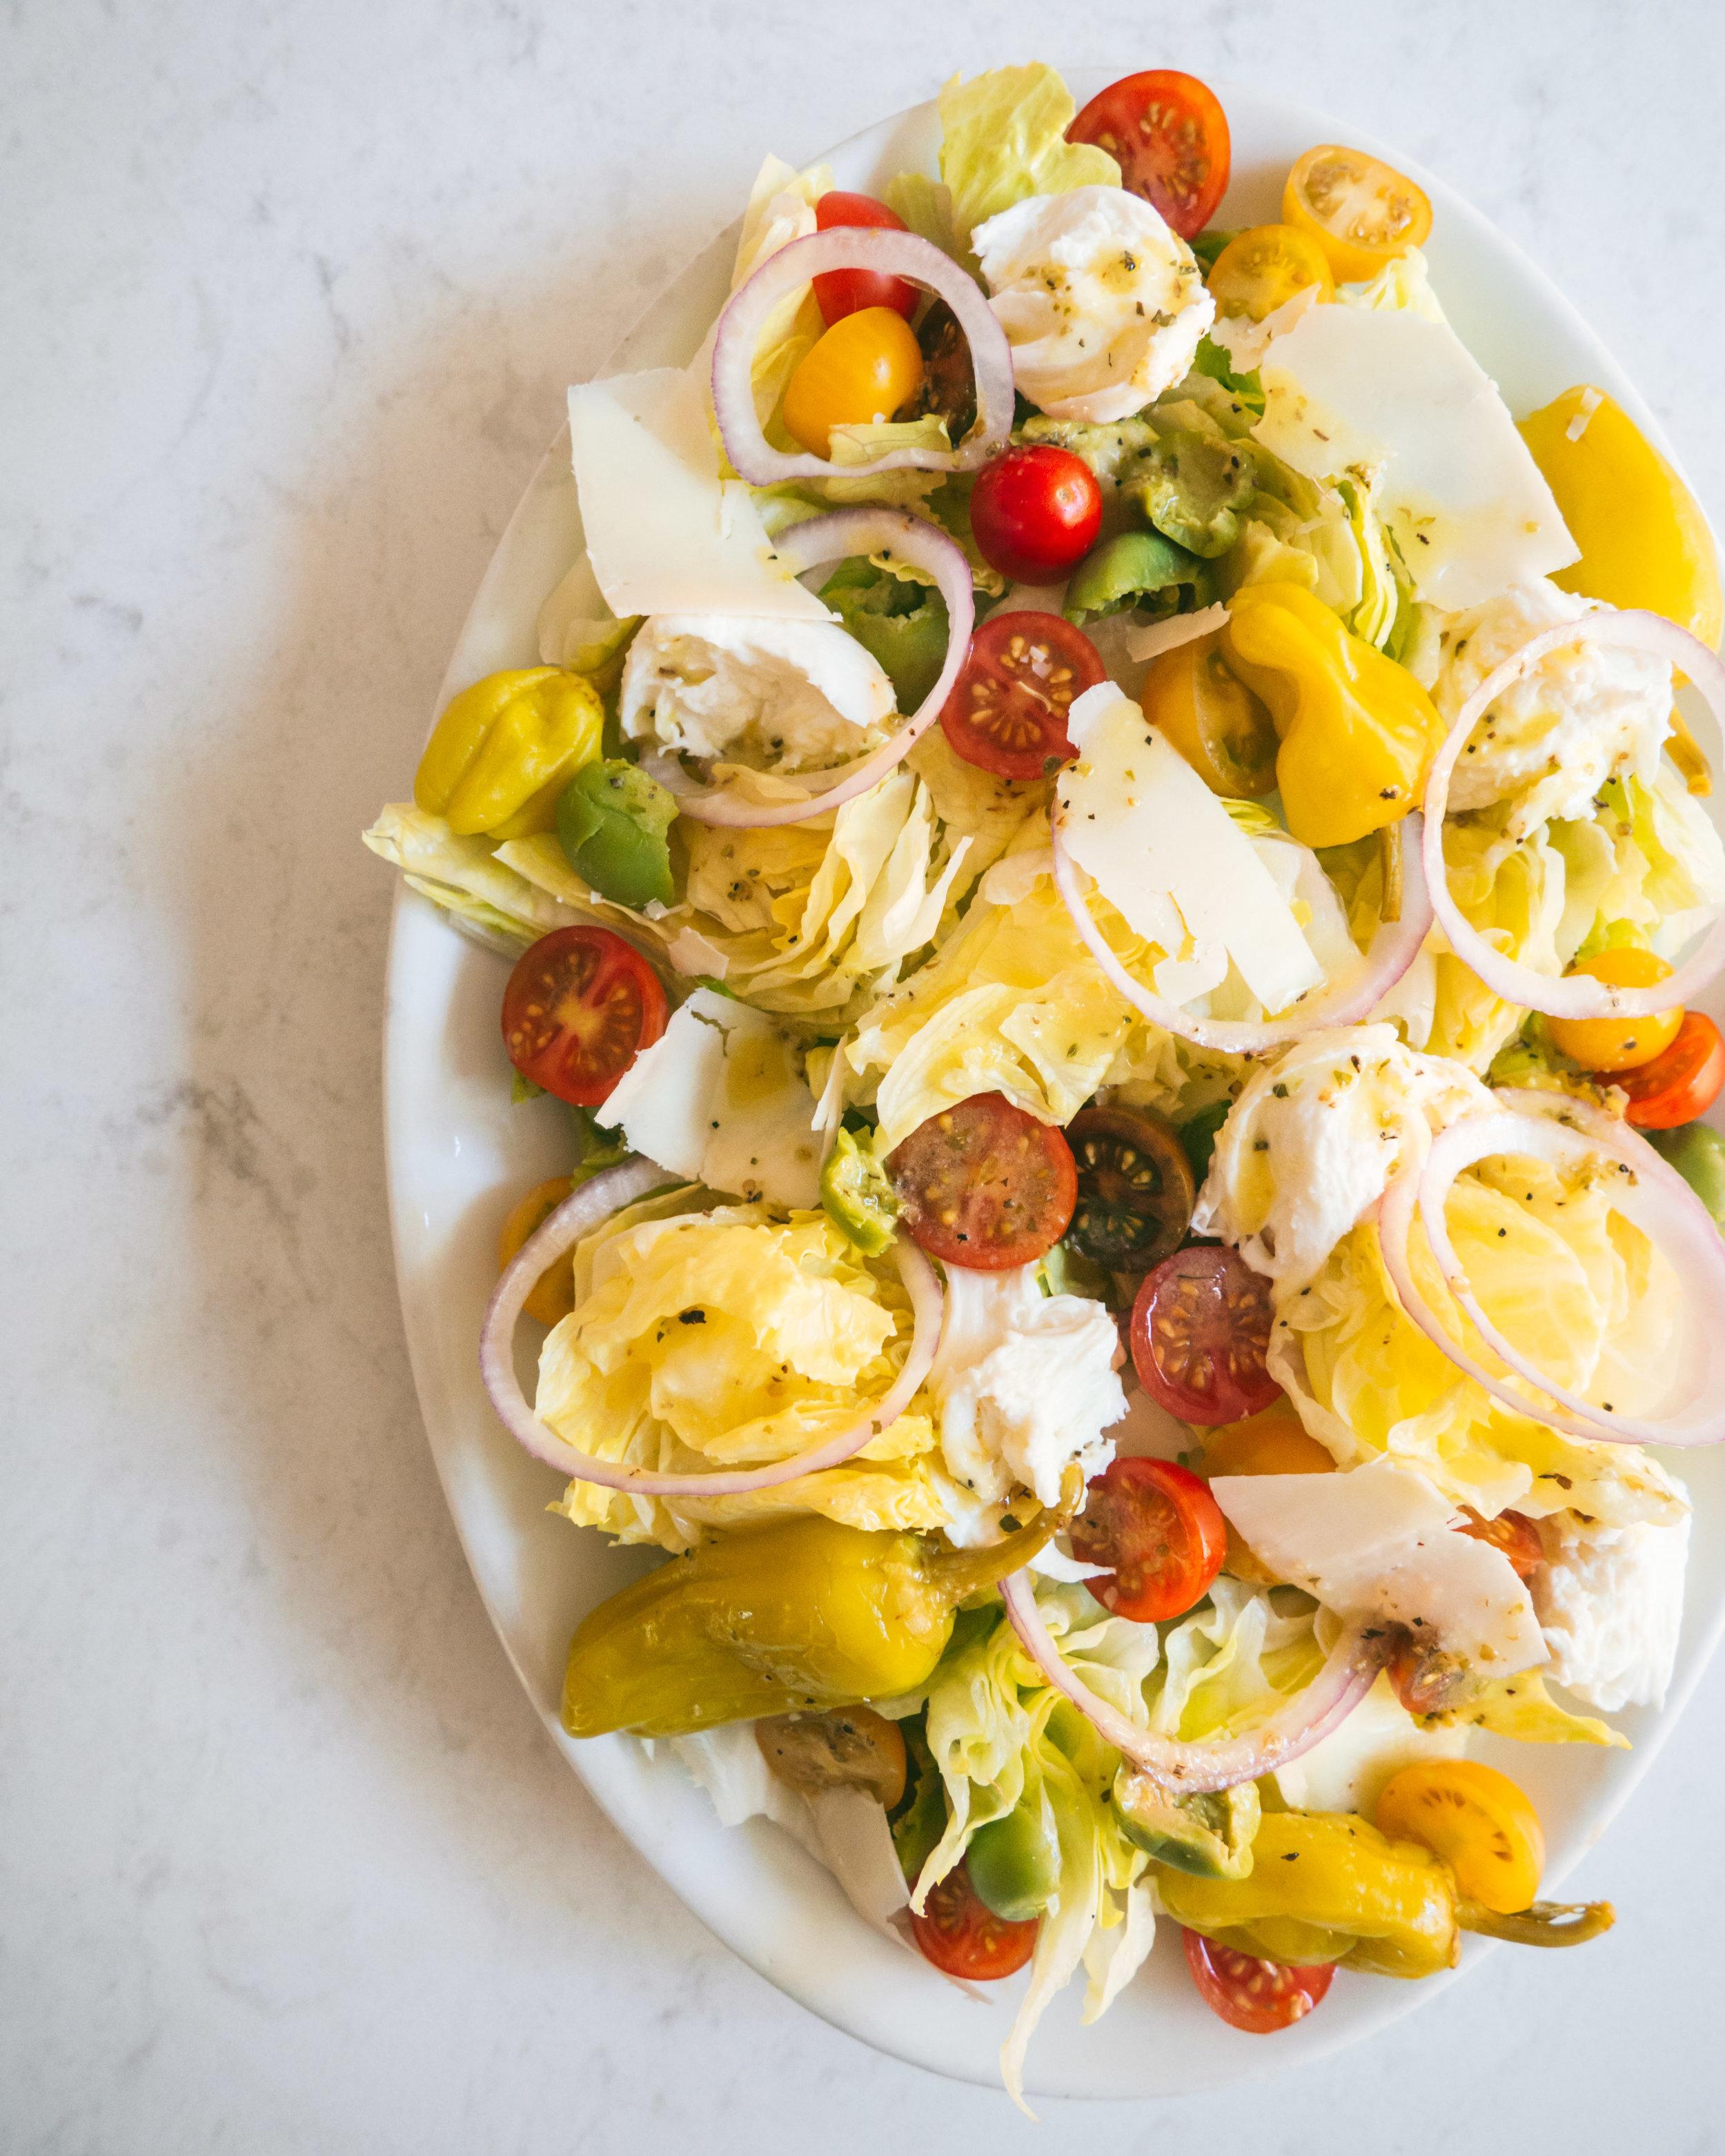 Italian Salad with Iceberg Lettuce, Tomatoes and Mozzarella